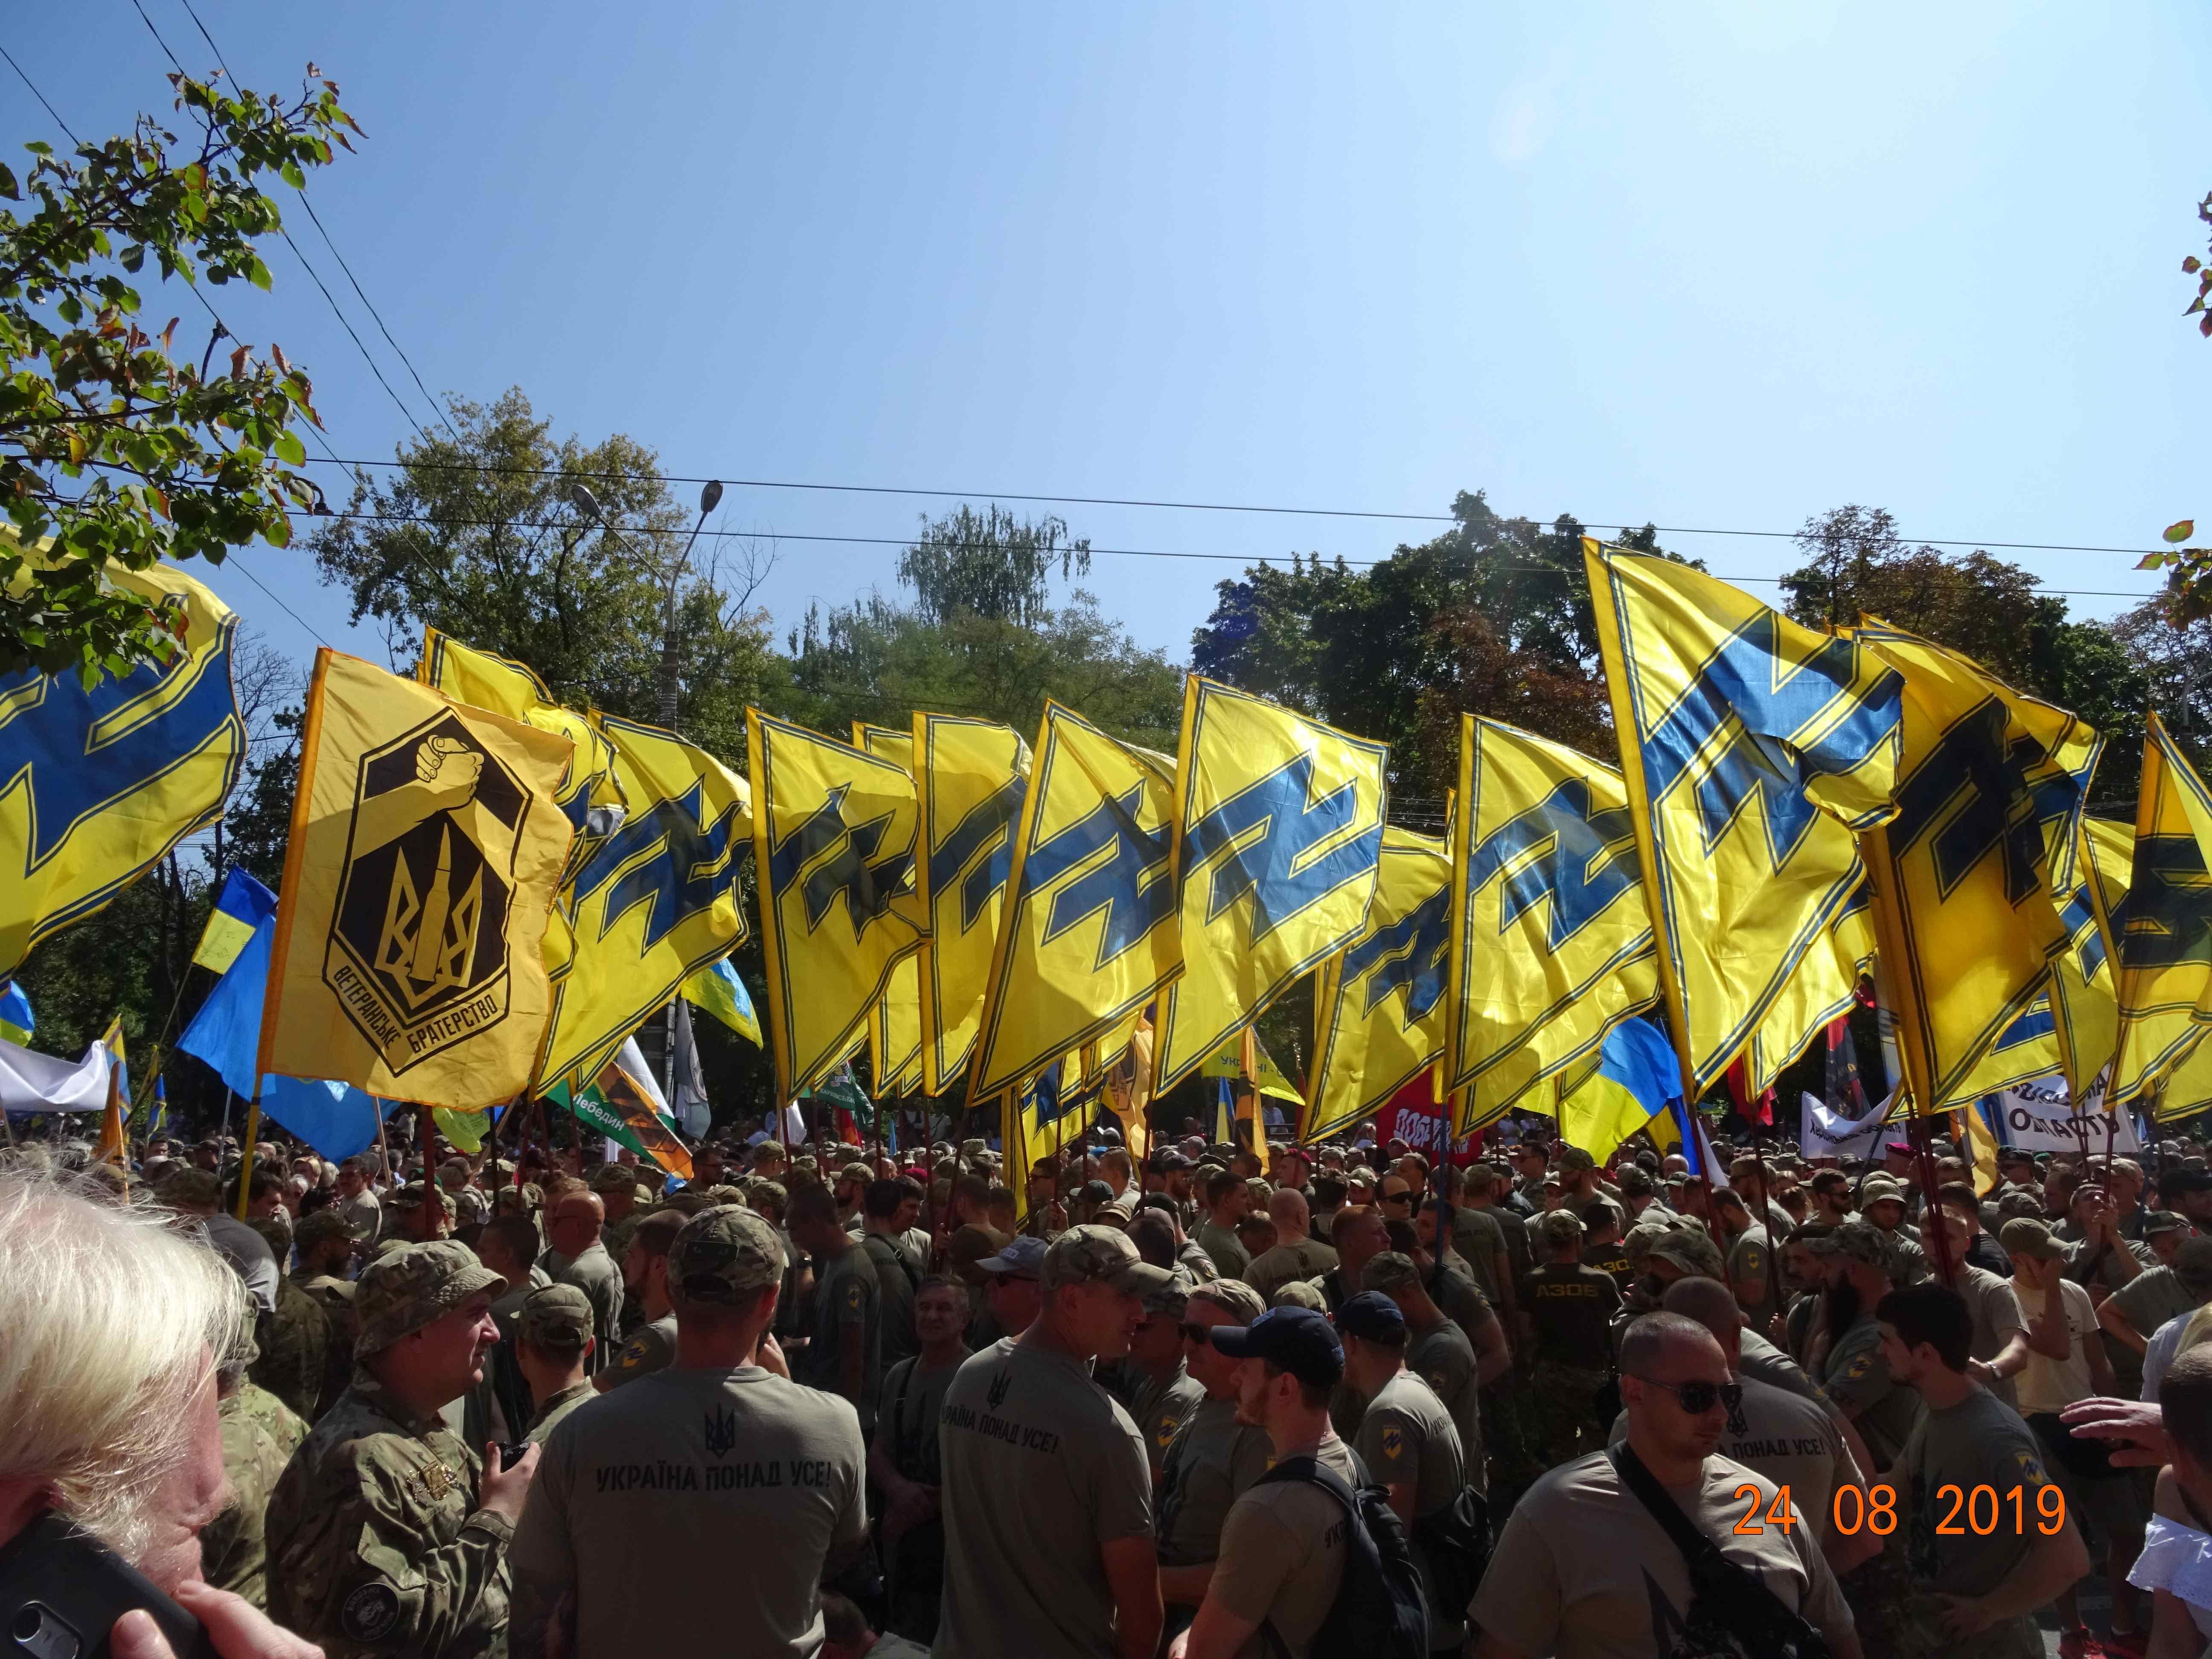 Defenders-of-Ukraine-Parad-24.Aug.19 - DSC06079.jpg